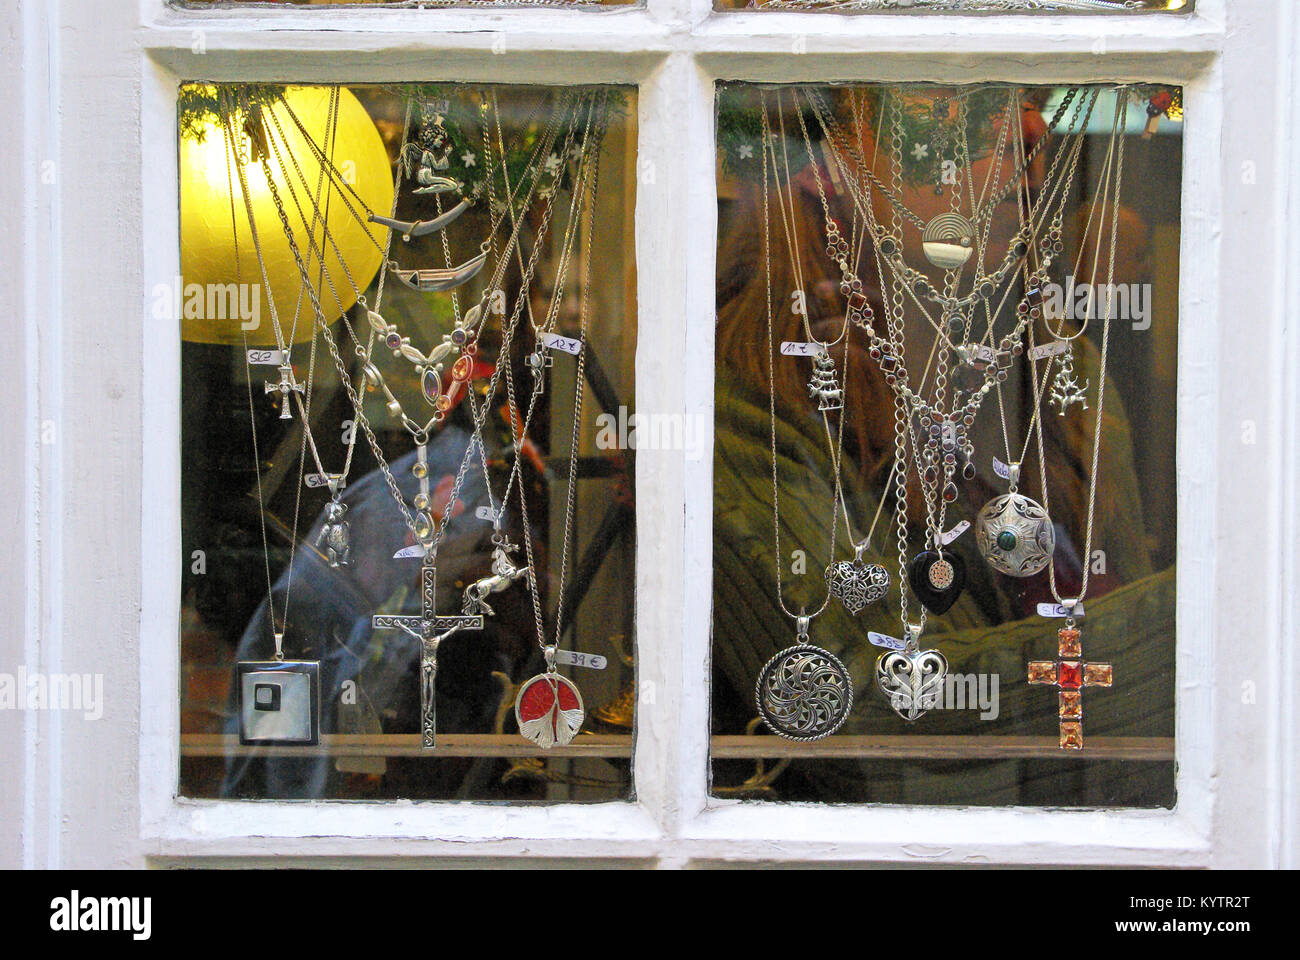 Bremen, Germany. The jewel shop - Stock Image